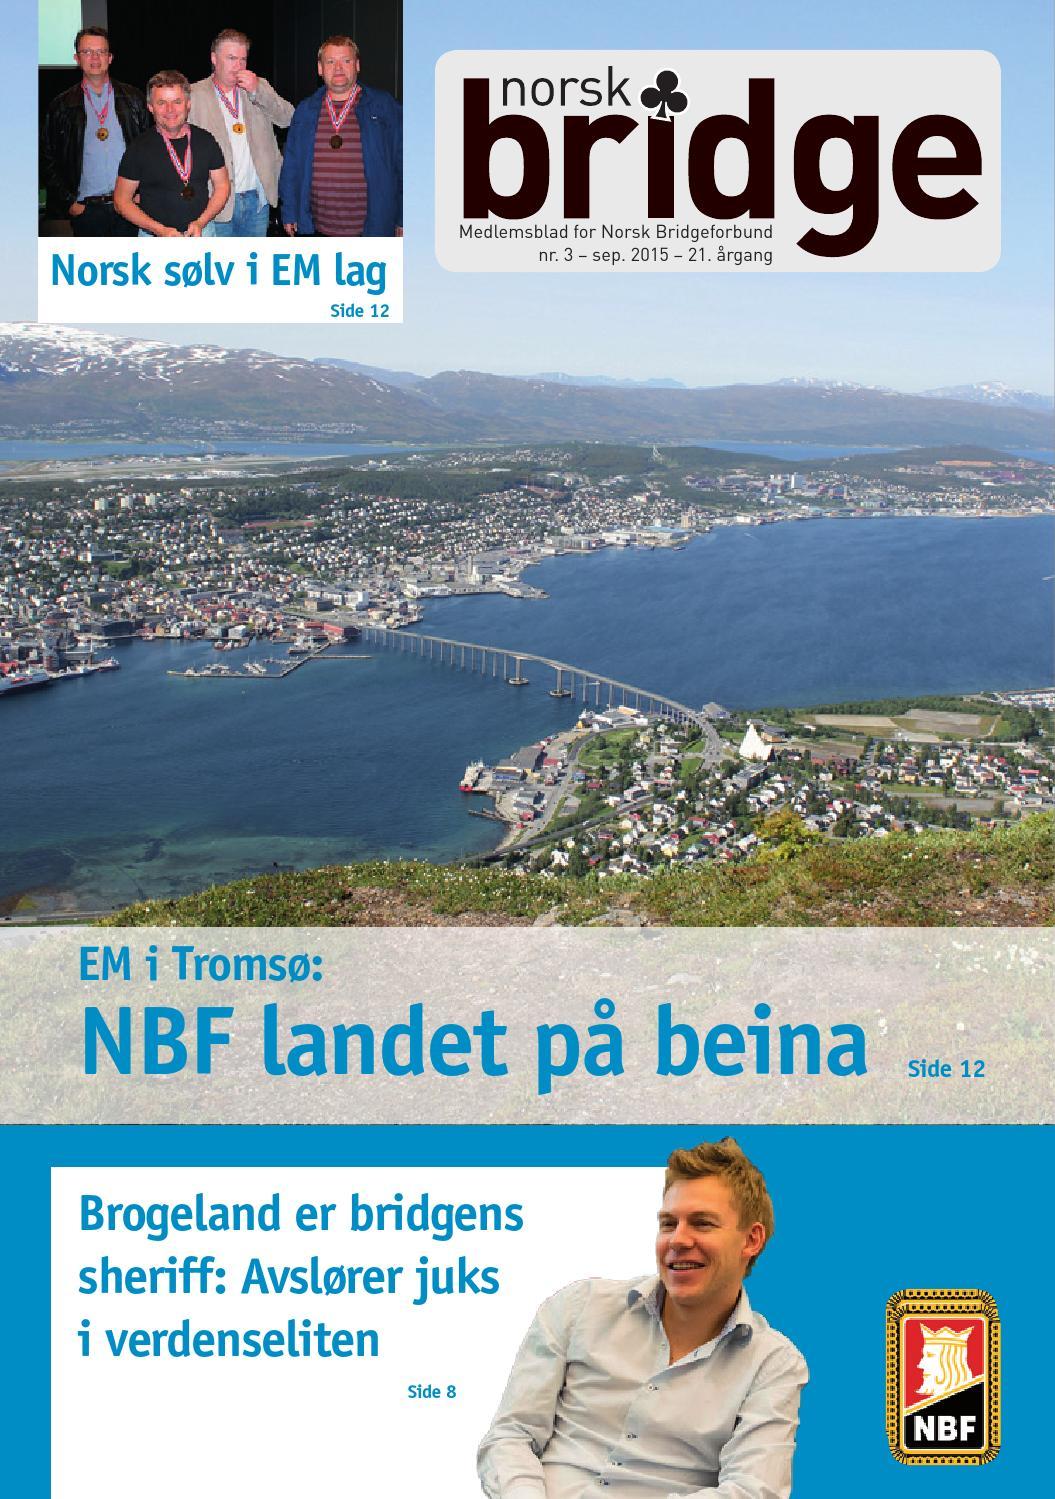 auli single klubb singeltreff bjørnafjorden